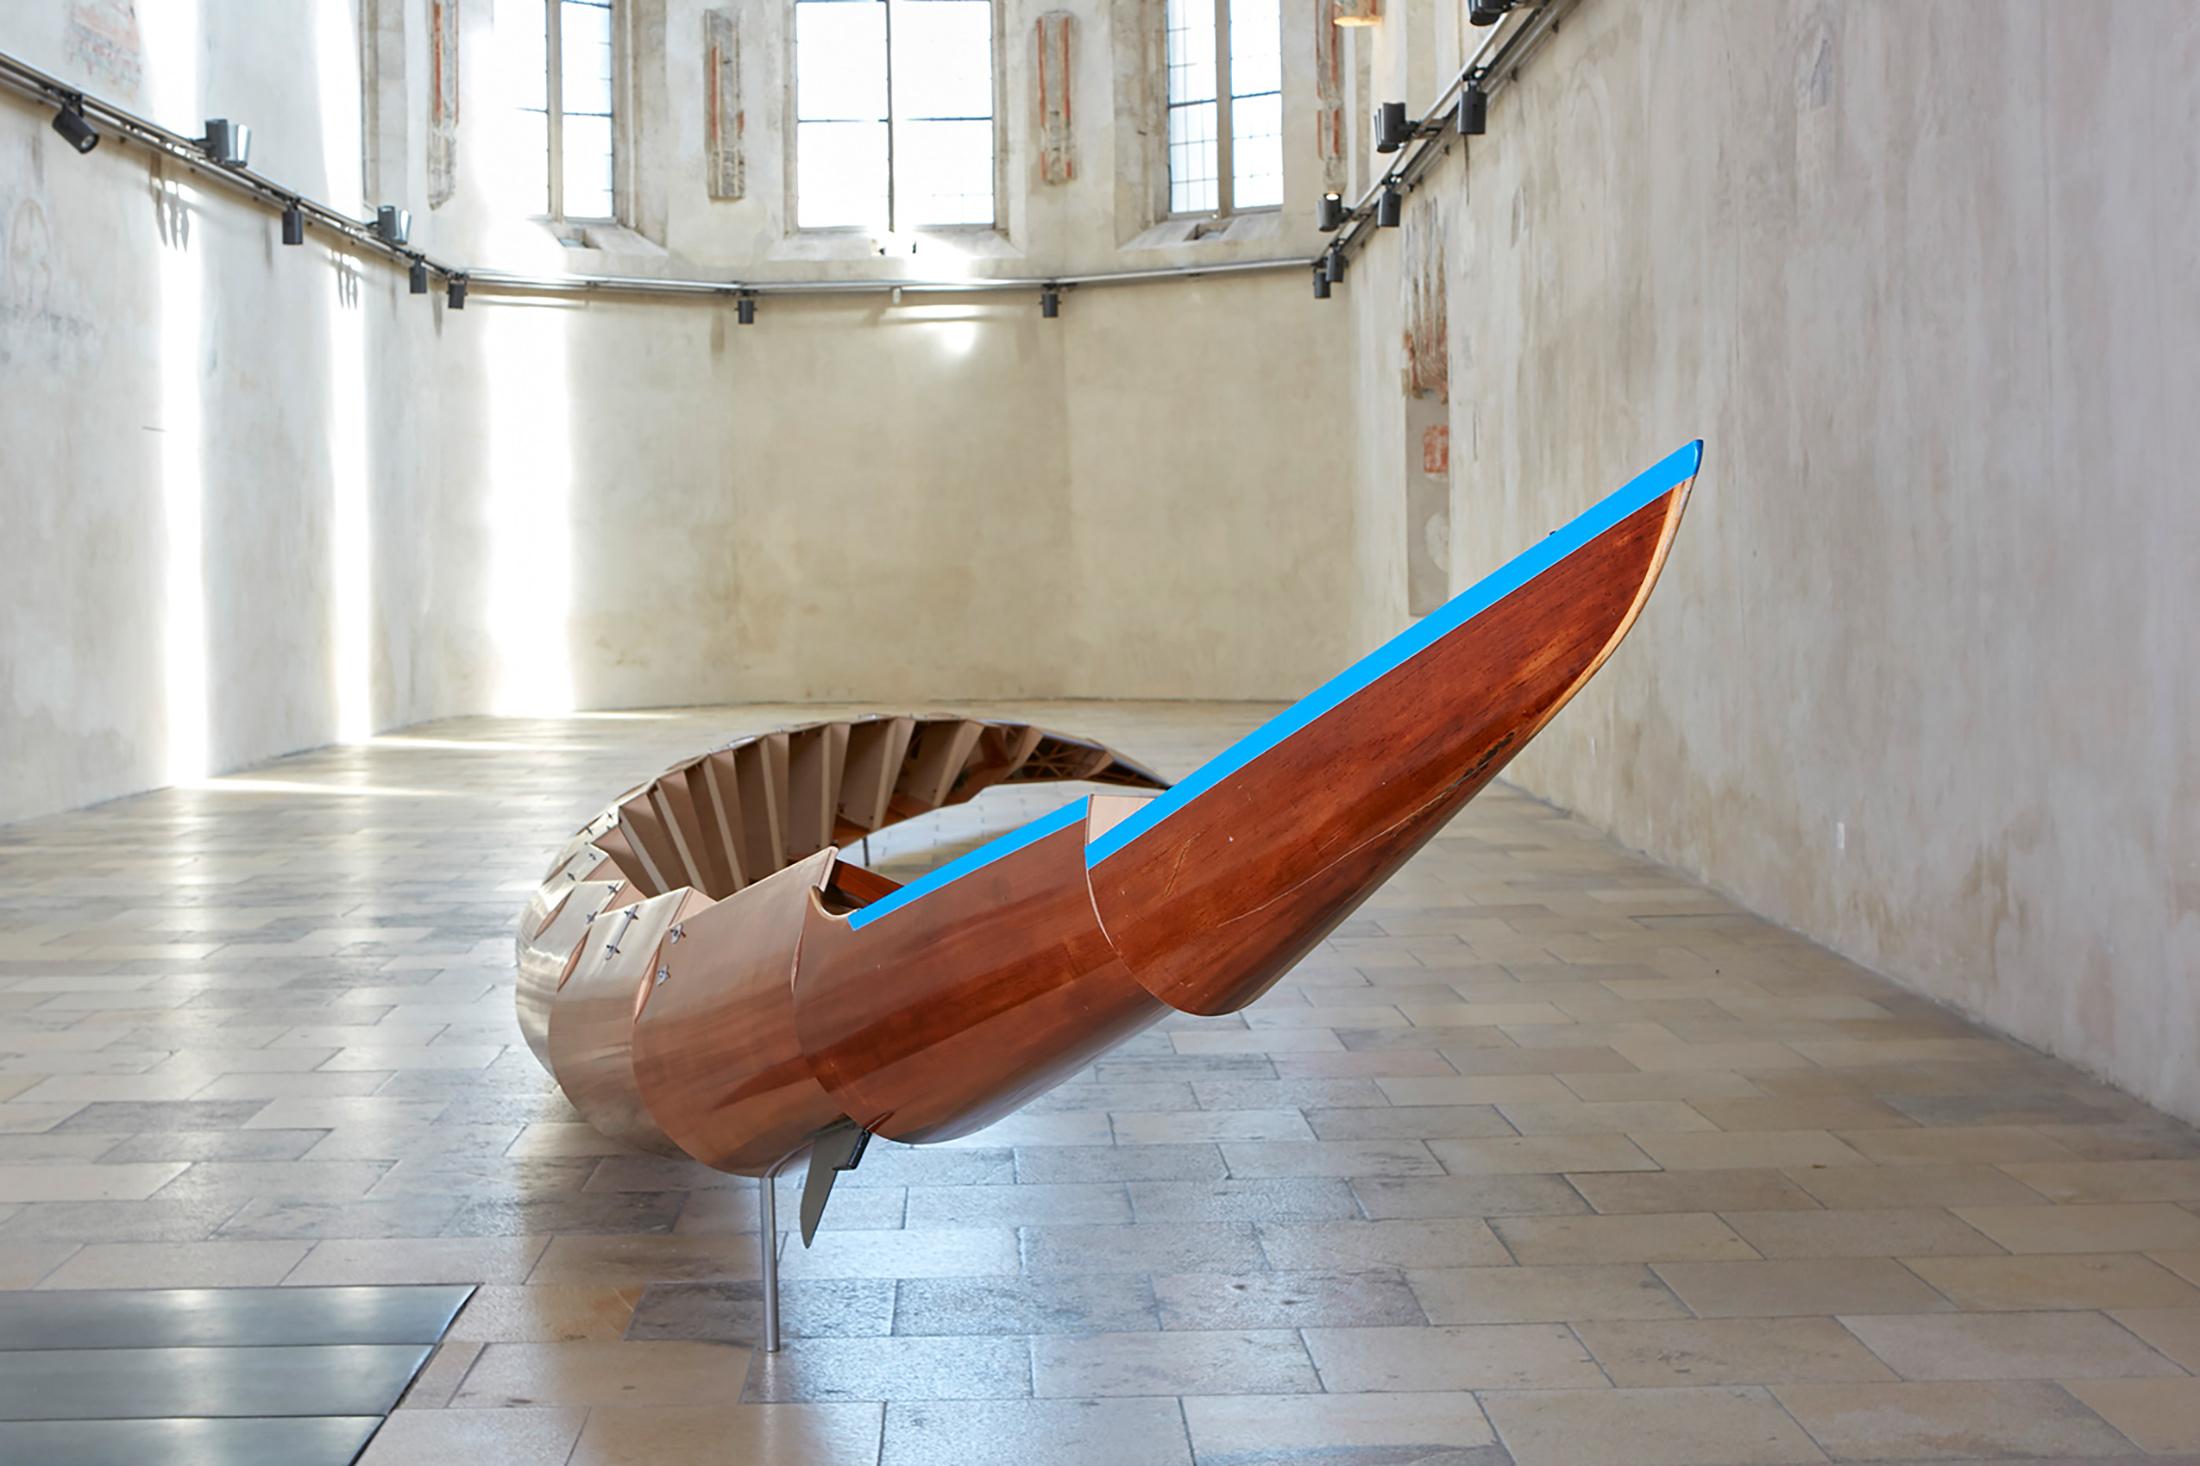 roman pfeffer, artist, leave the planet, exhibition, viewing room, munchies art club